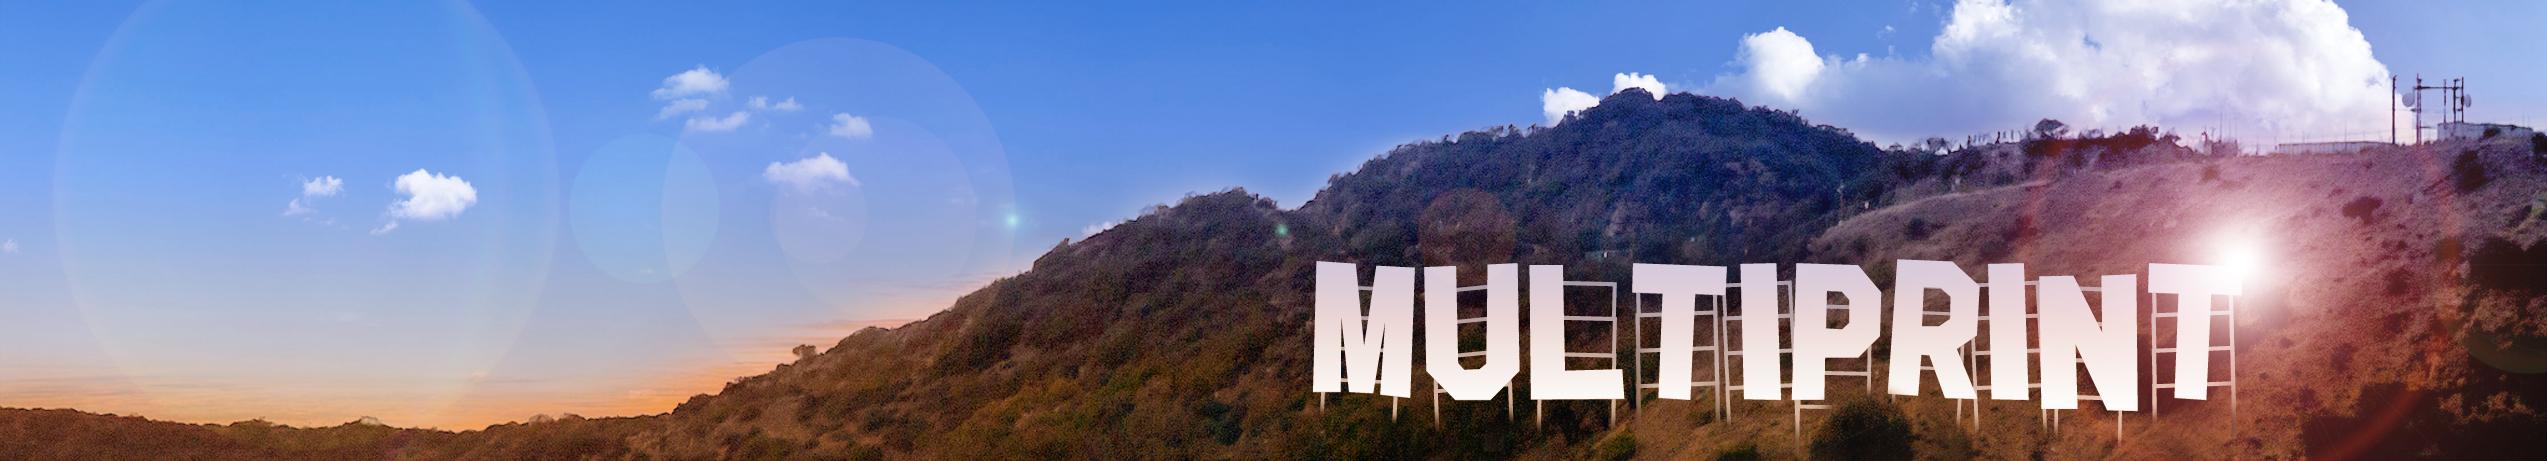 multiprinthills